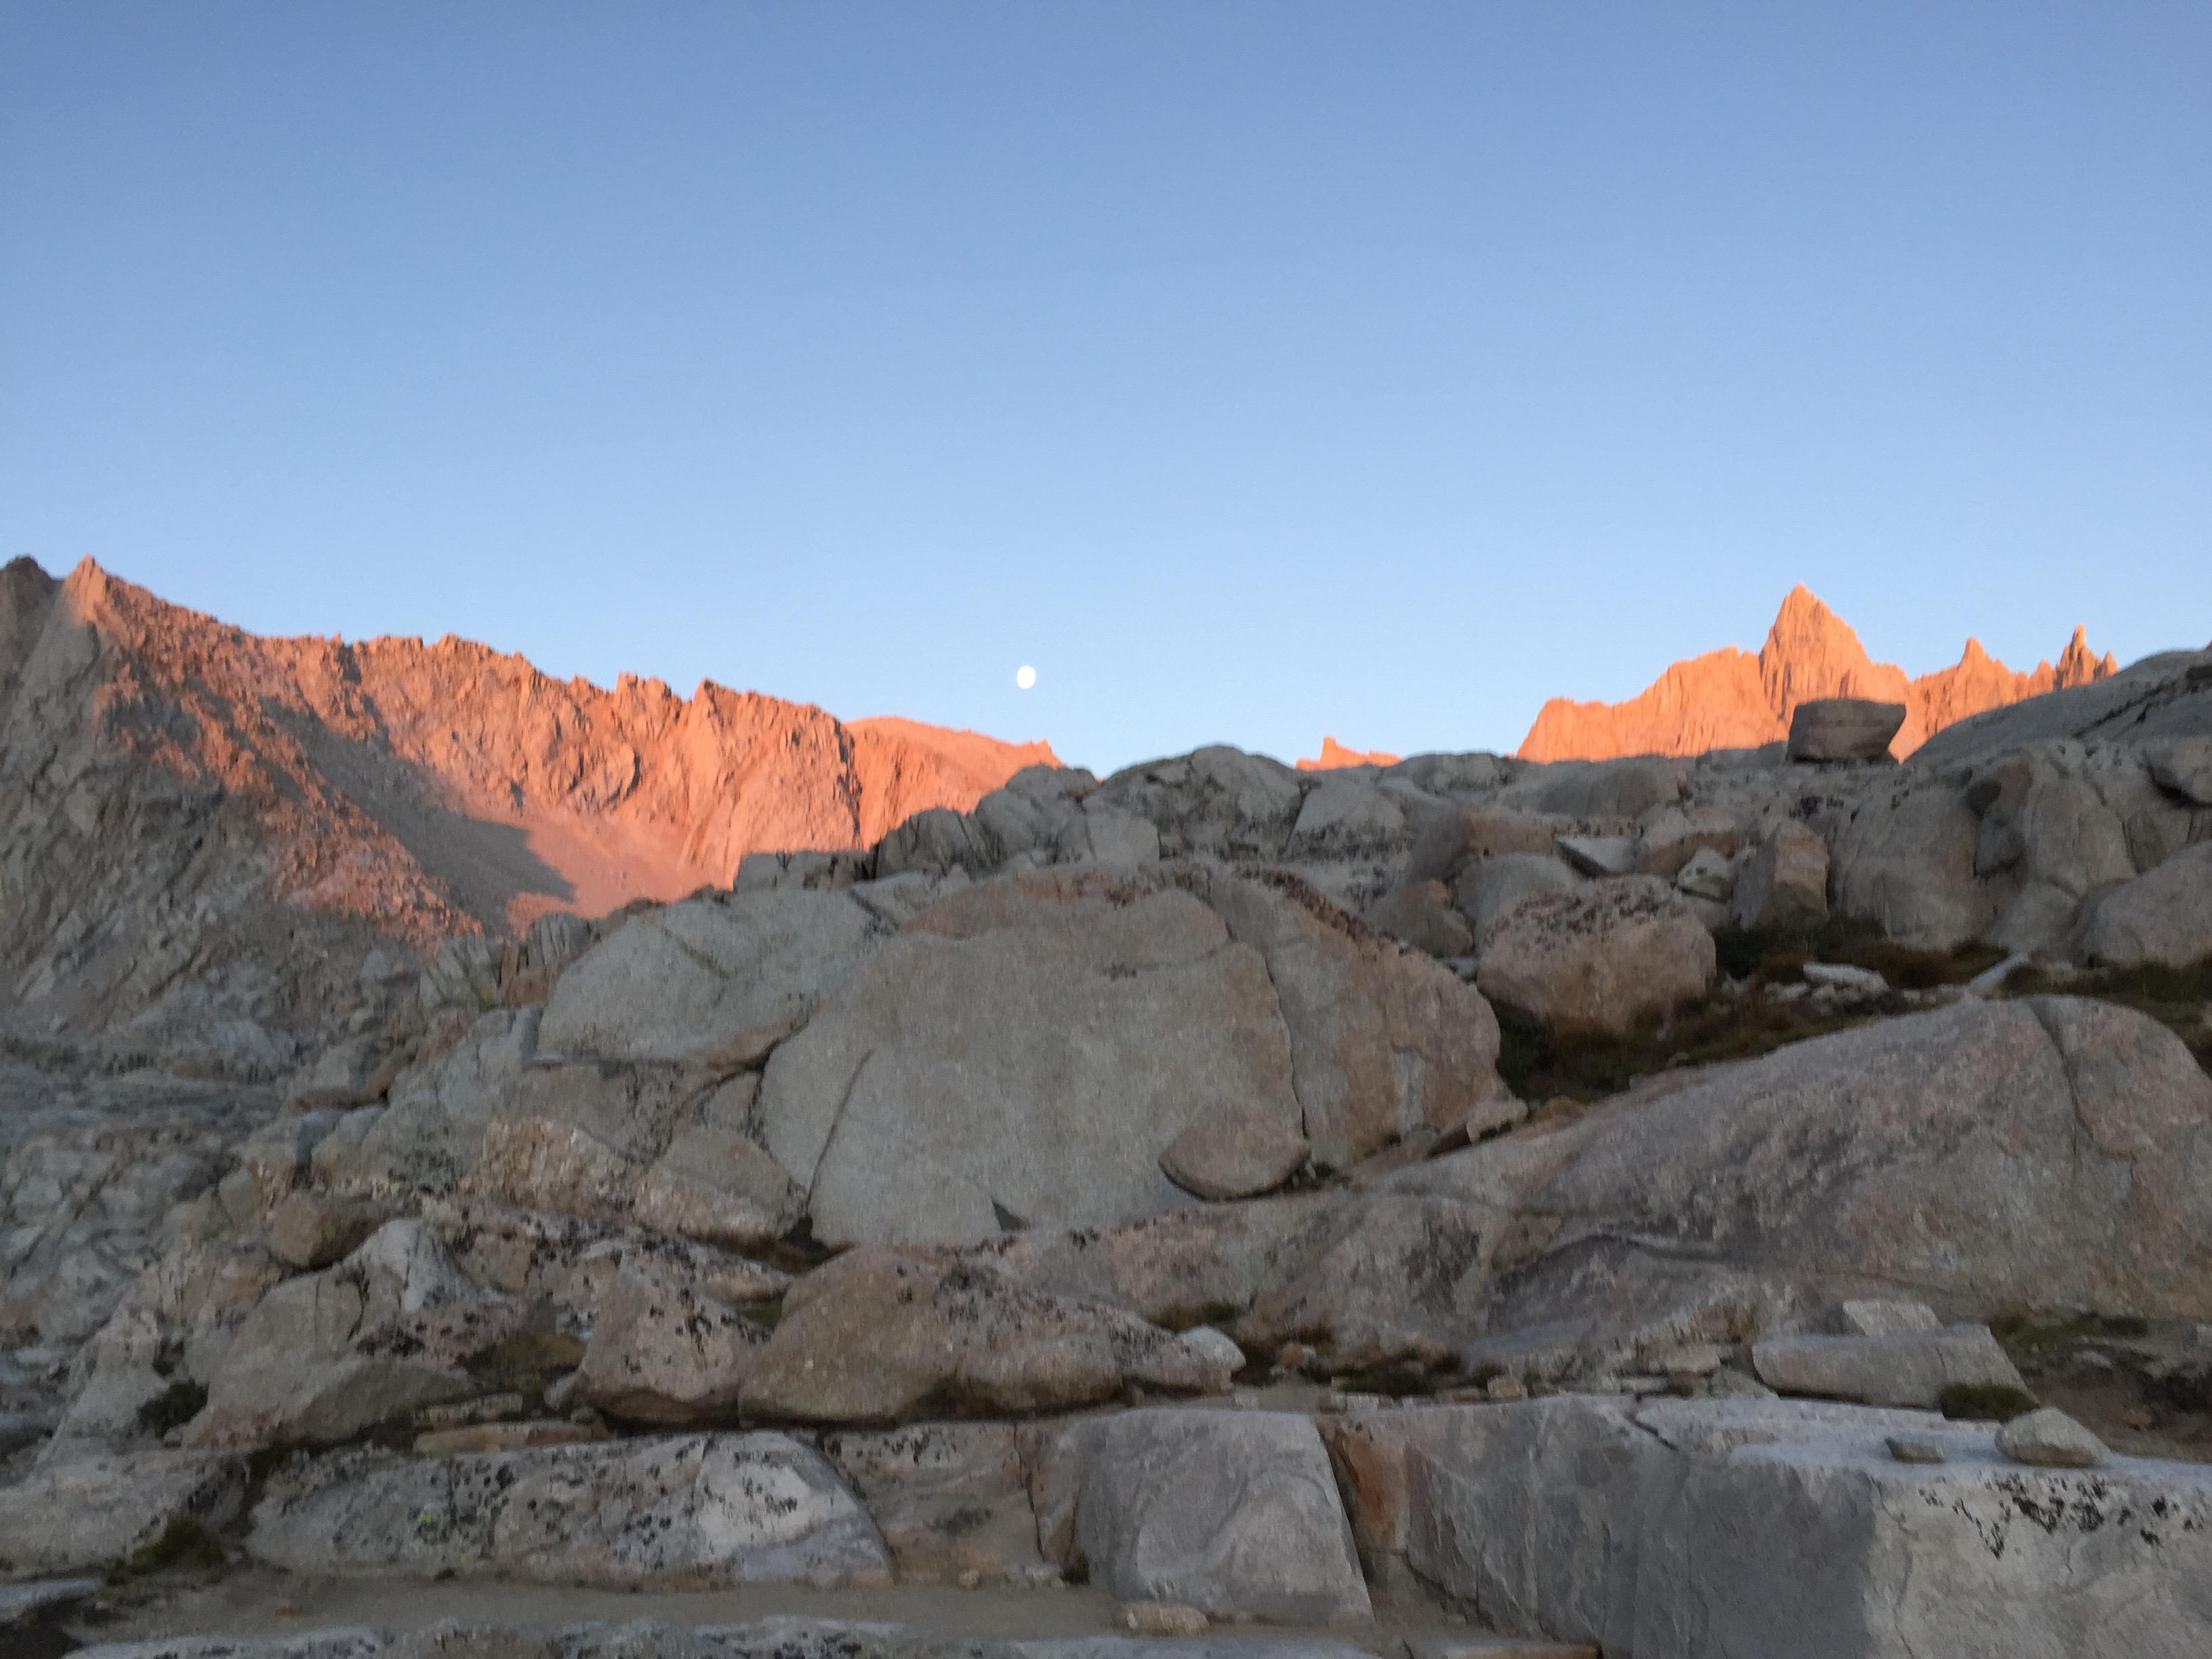 Moon set over Mt. Whitney range